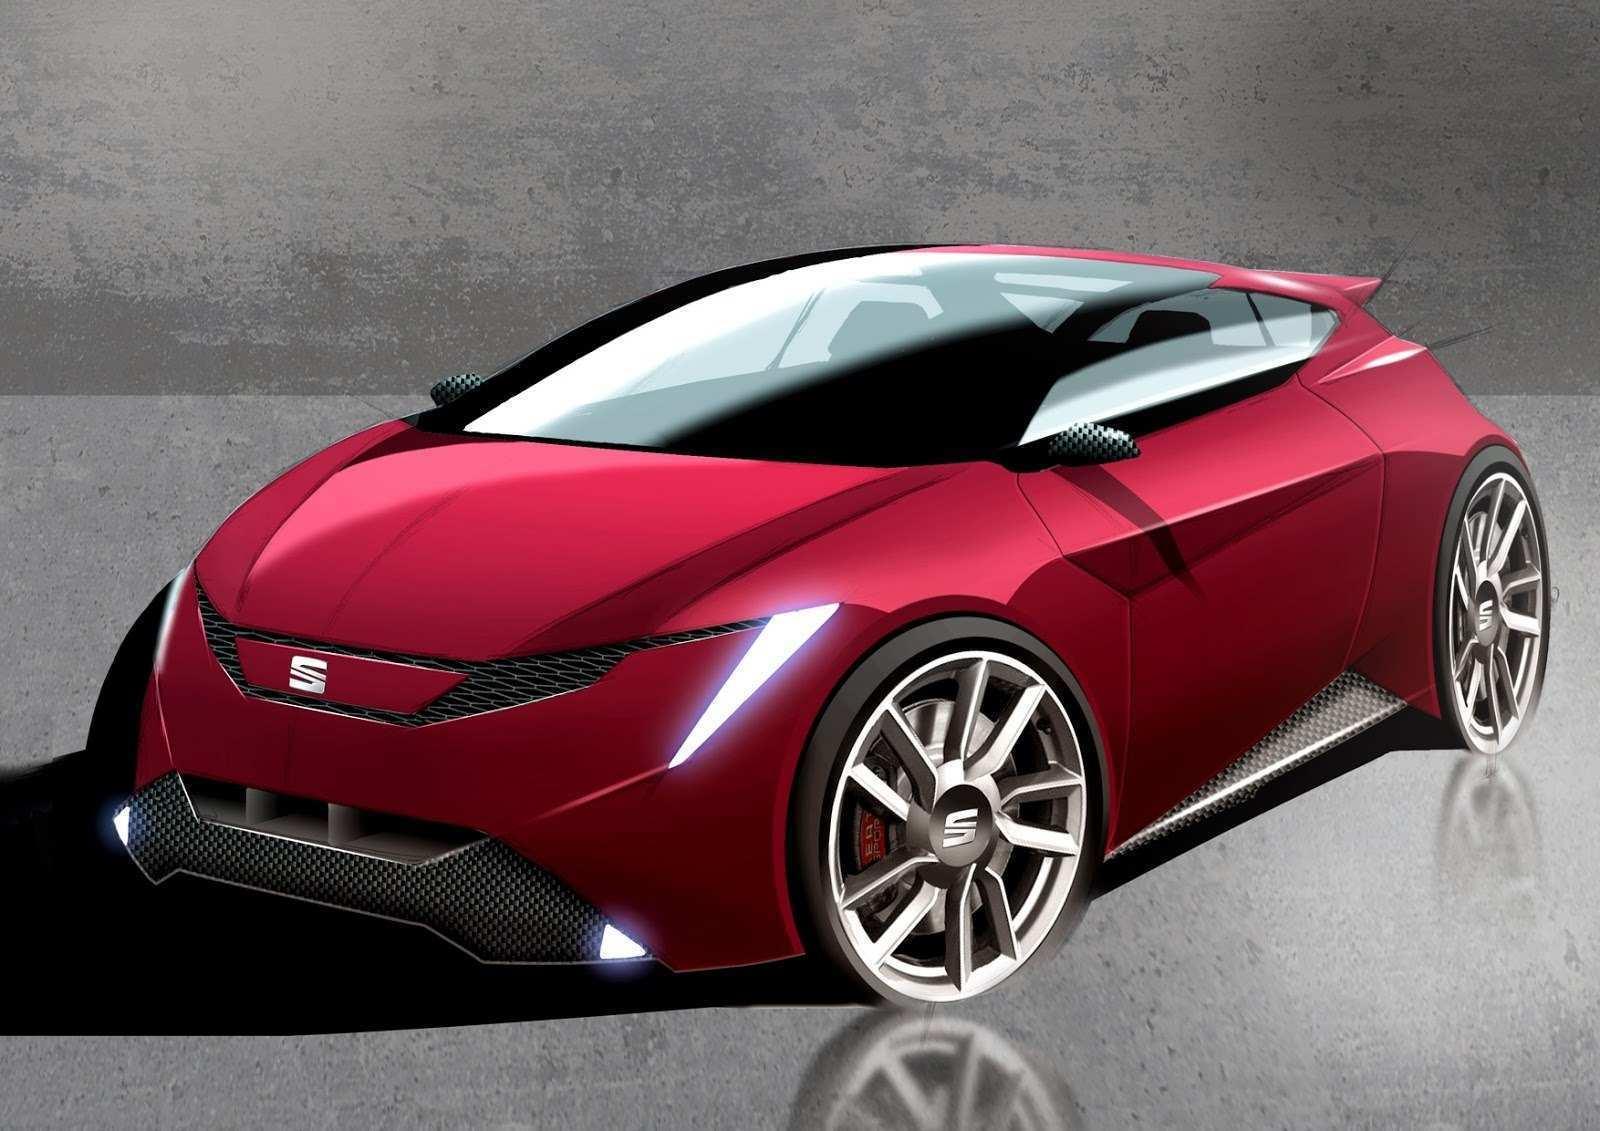 13 All New 2020 Seat Ibiza Redesign with 2020 Seat Ibiza